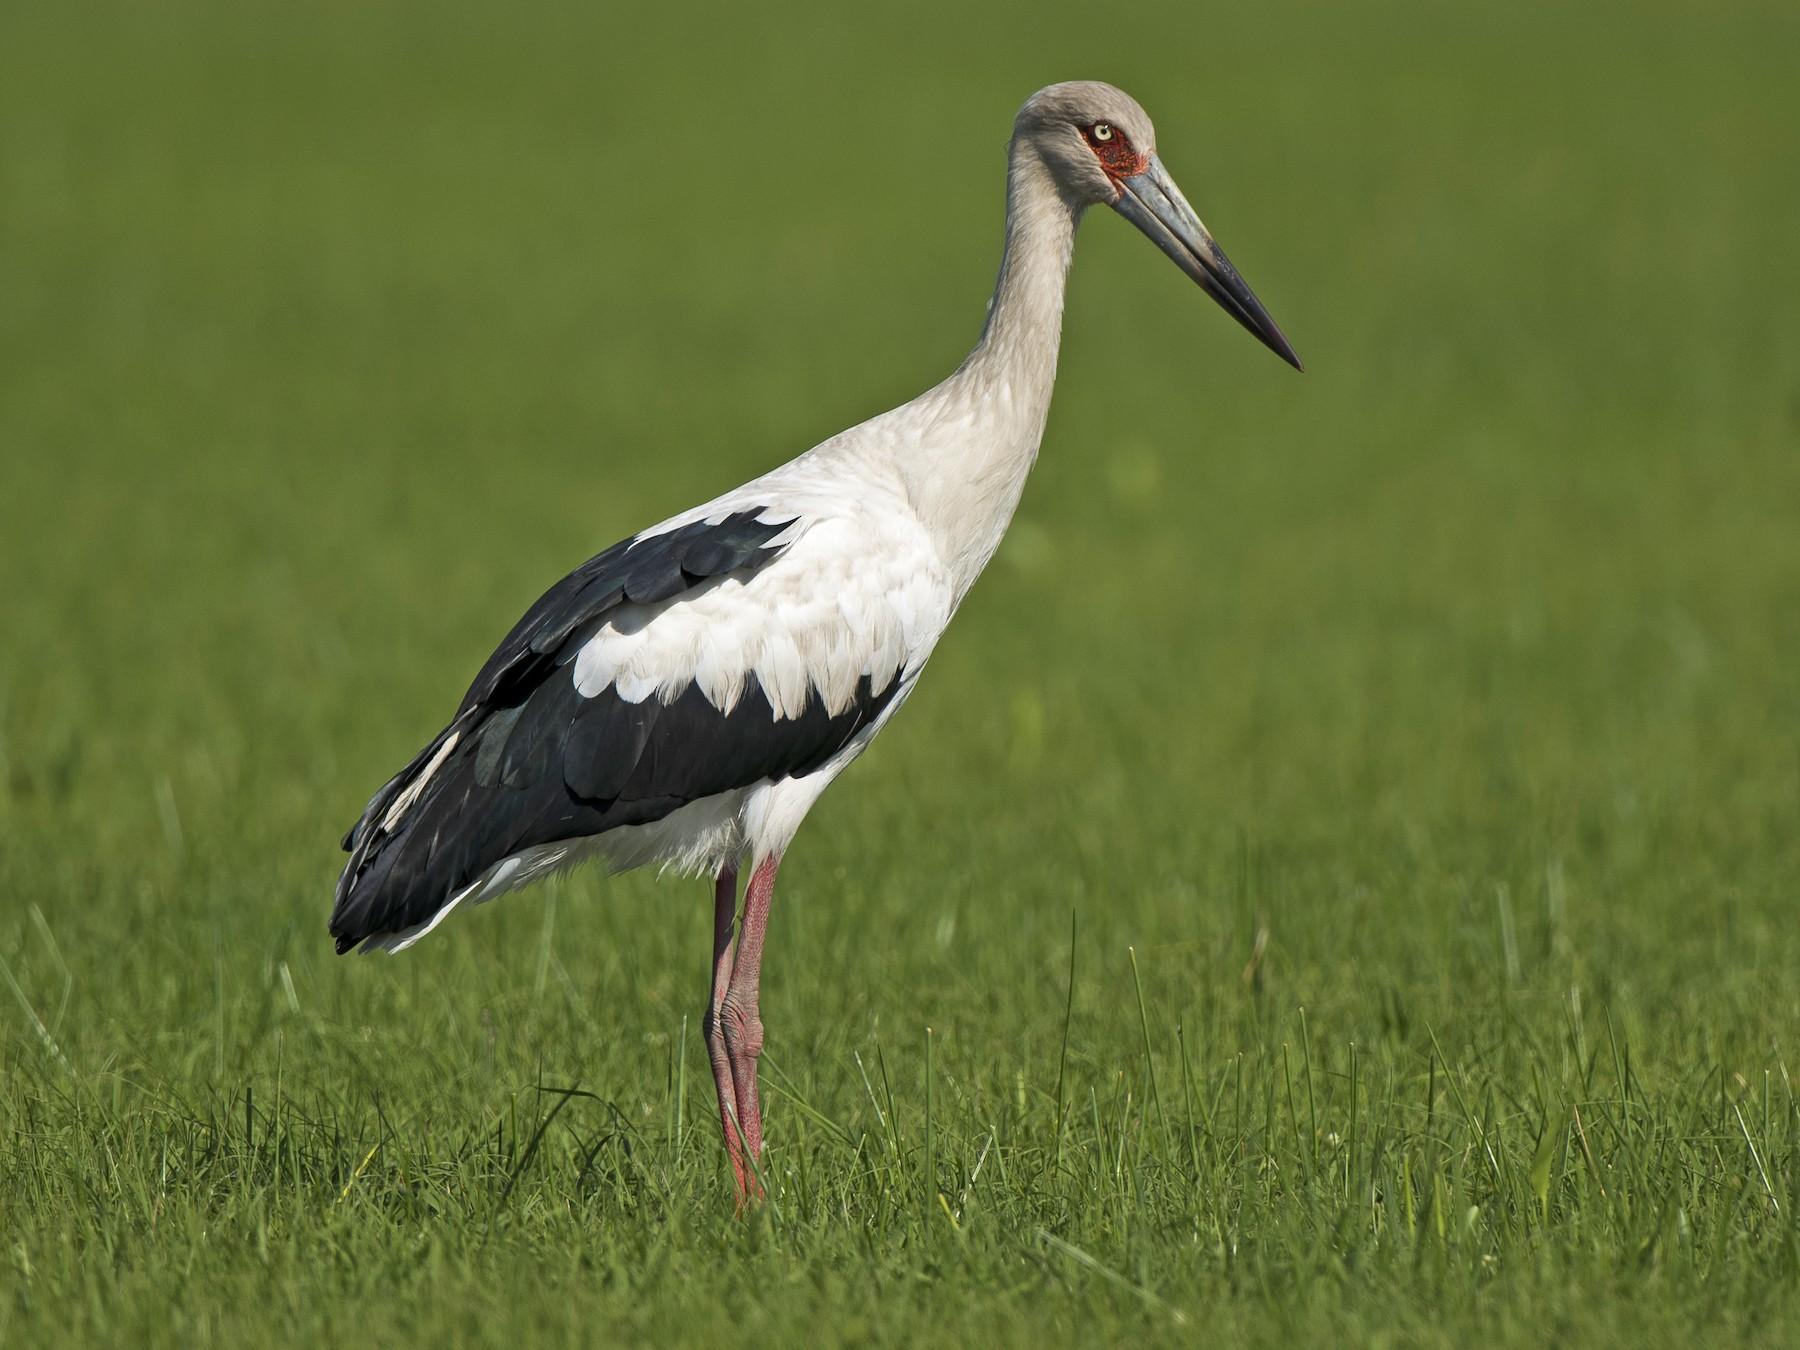 Maguari Stork - Luiz Carlos Ramassotti